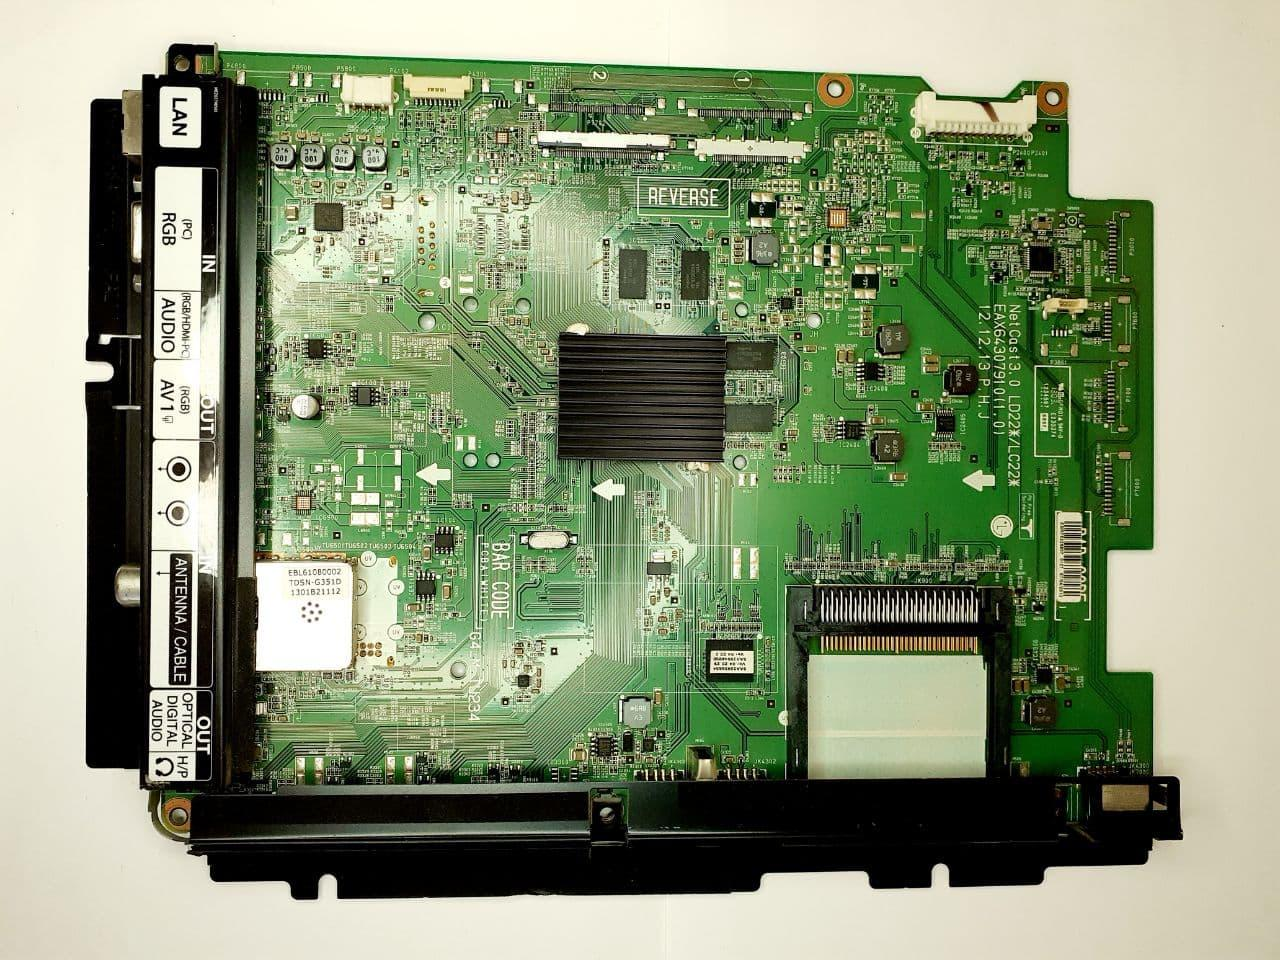 Плата Main для телевізора LG 42lm EAX64307910 (1.0) LD22